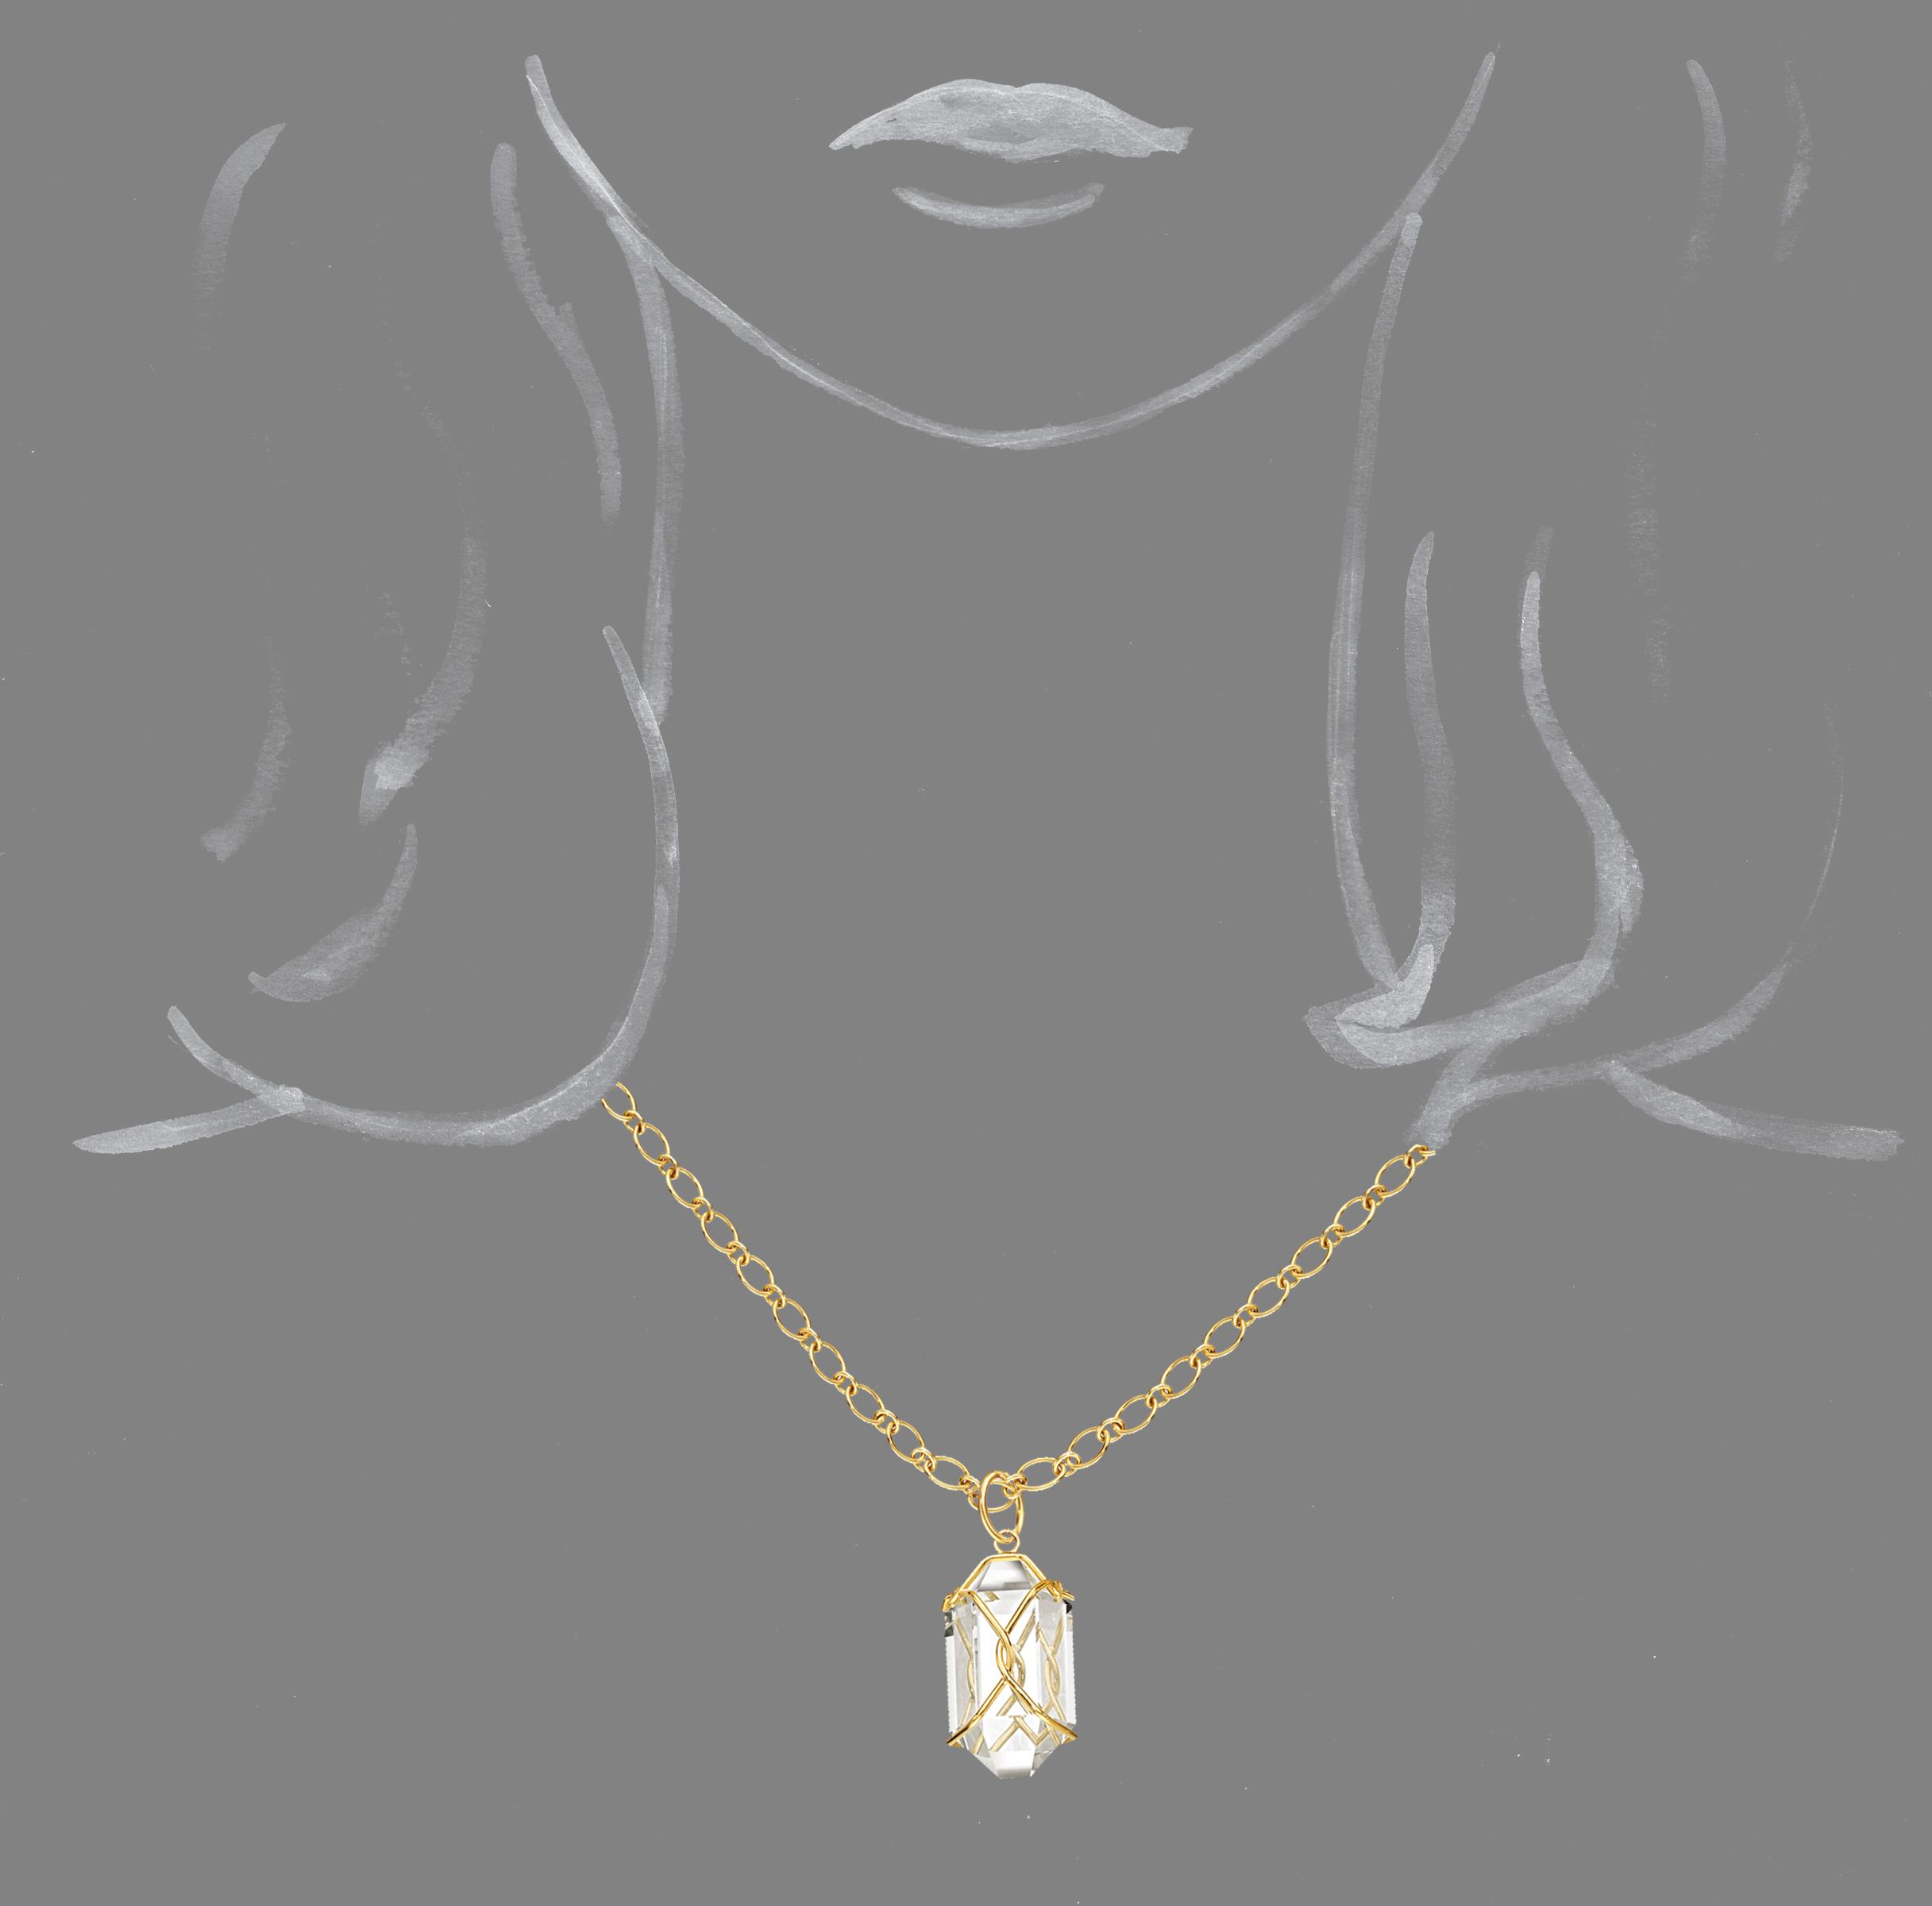 Verdura-Jewelry-Herkimer-Necklace-Rock-Crystal-Scale-Rendering